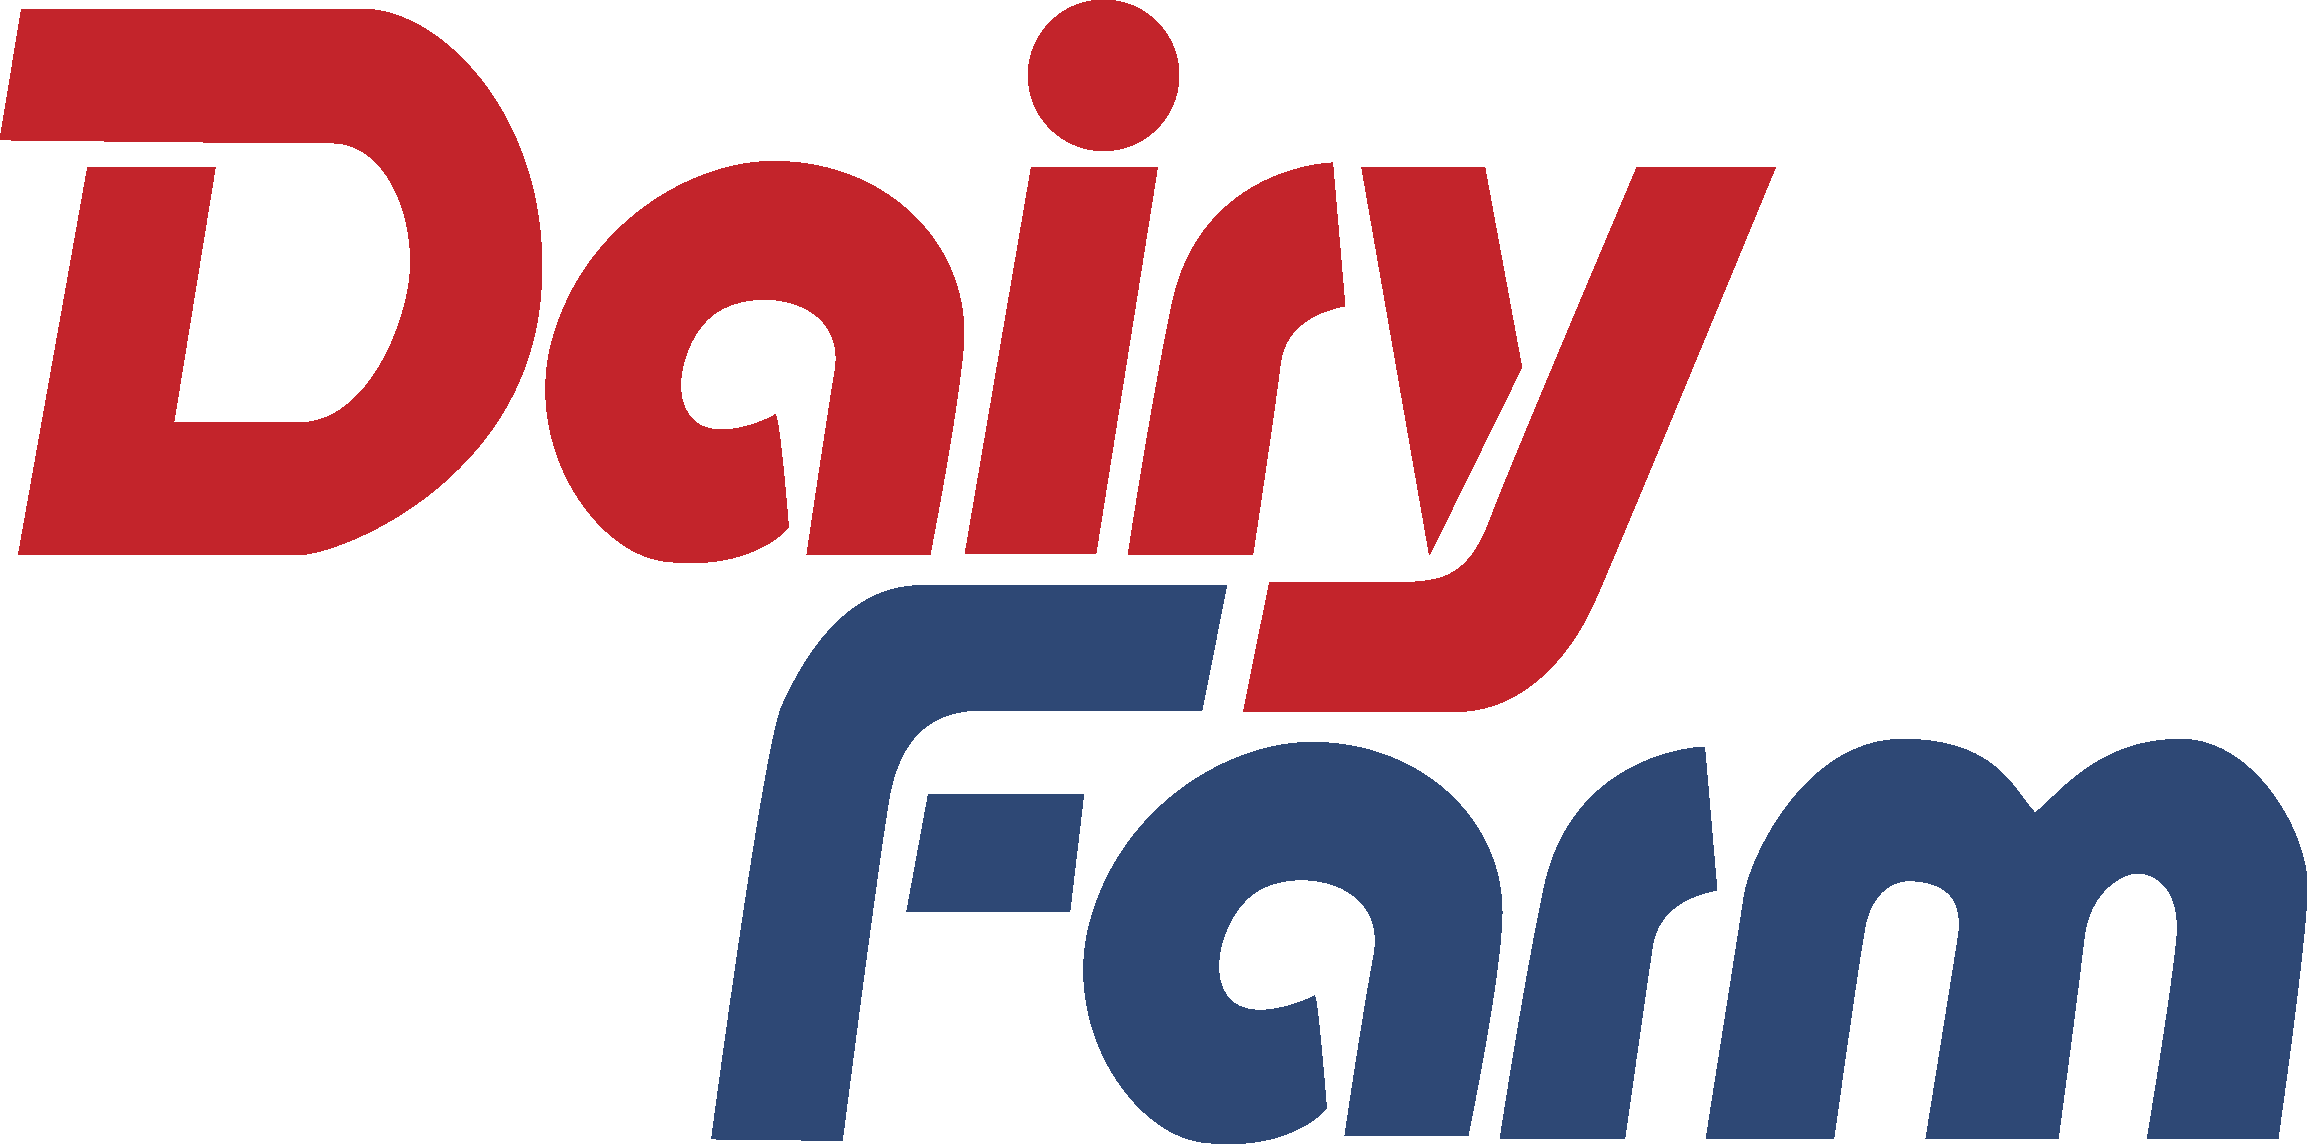 Dairy Farm Logo png